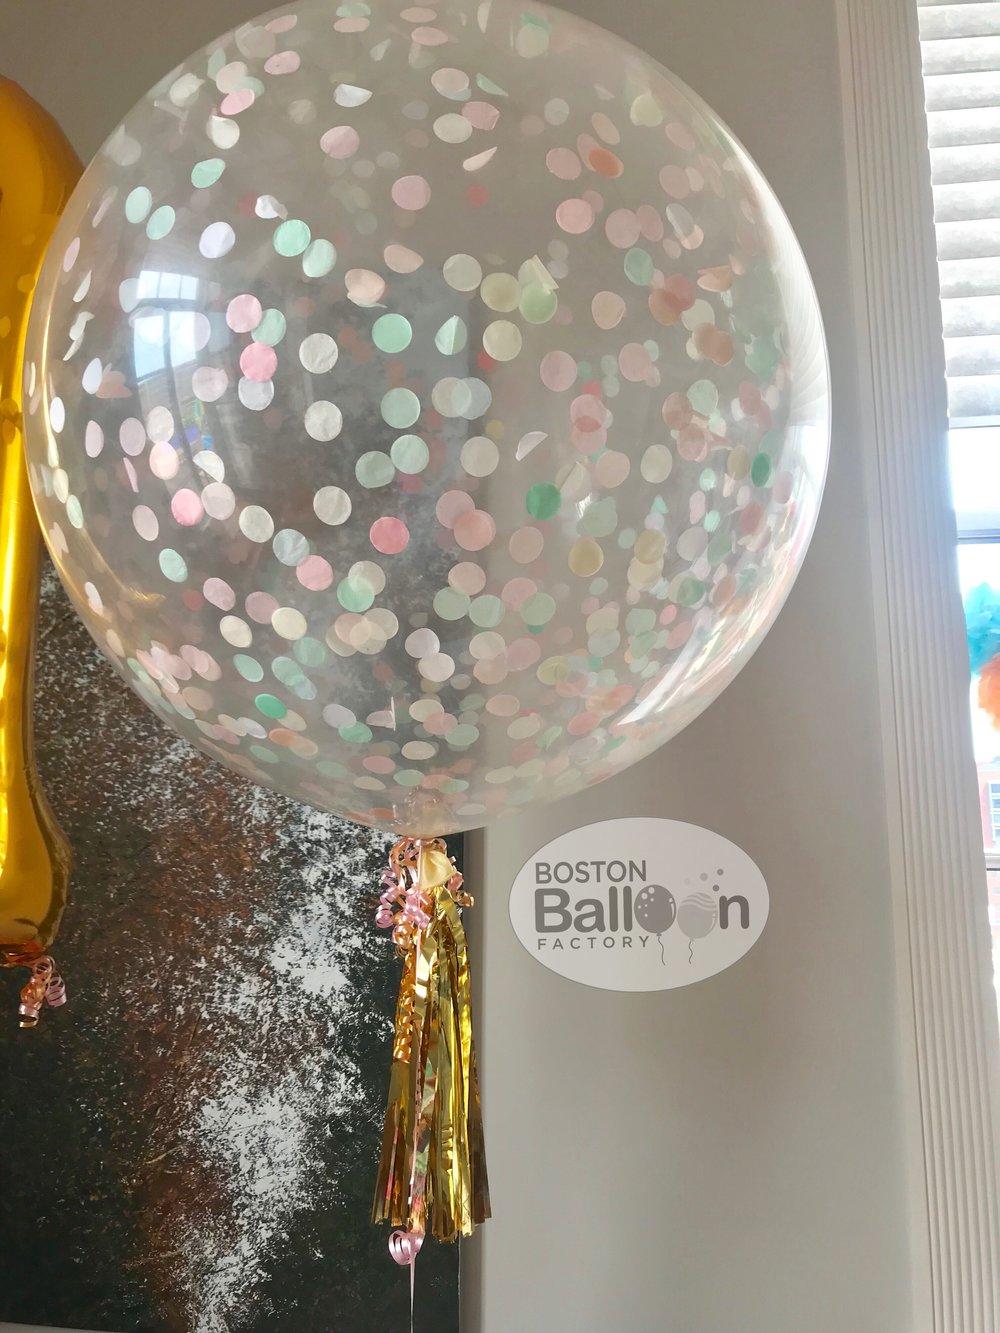 3 Foot Confetti Filled Balloon!